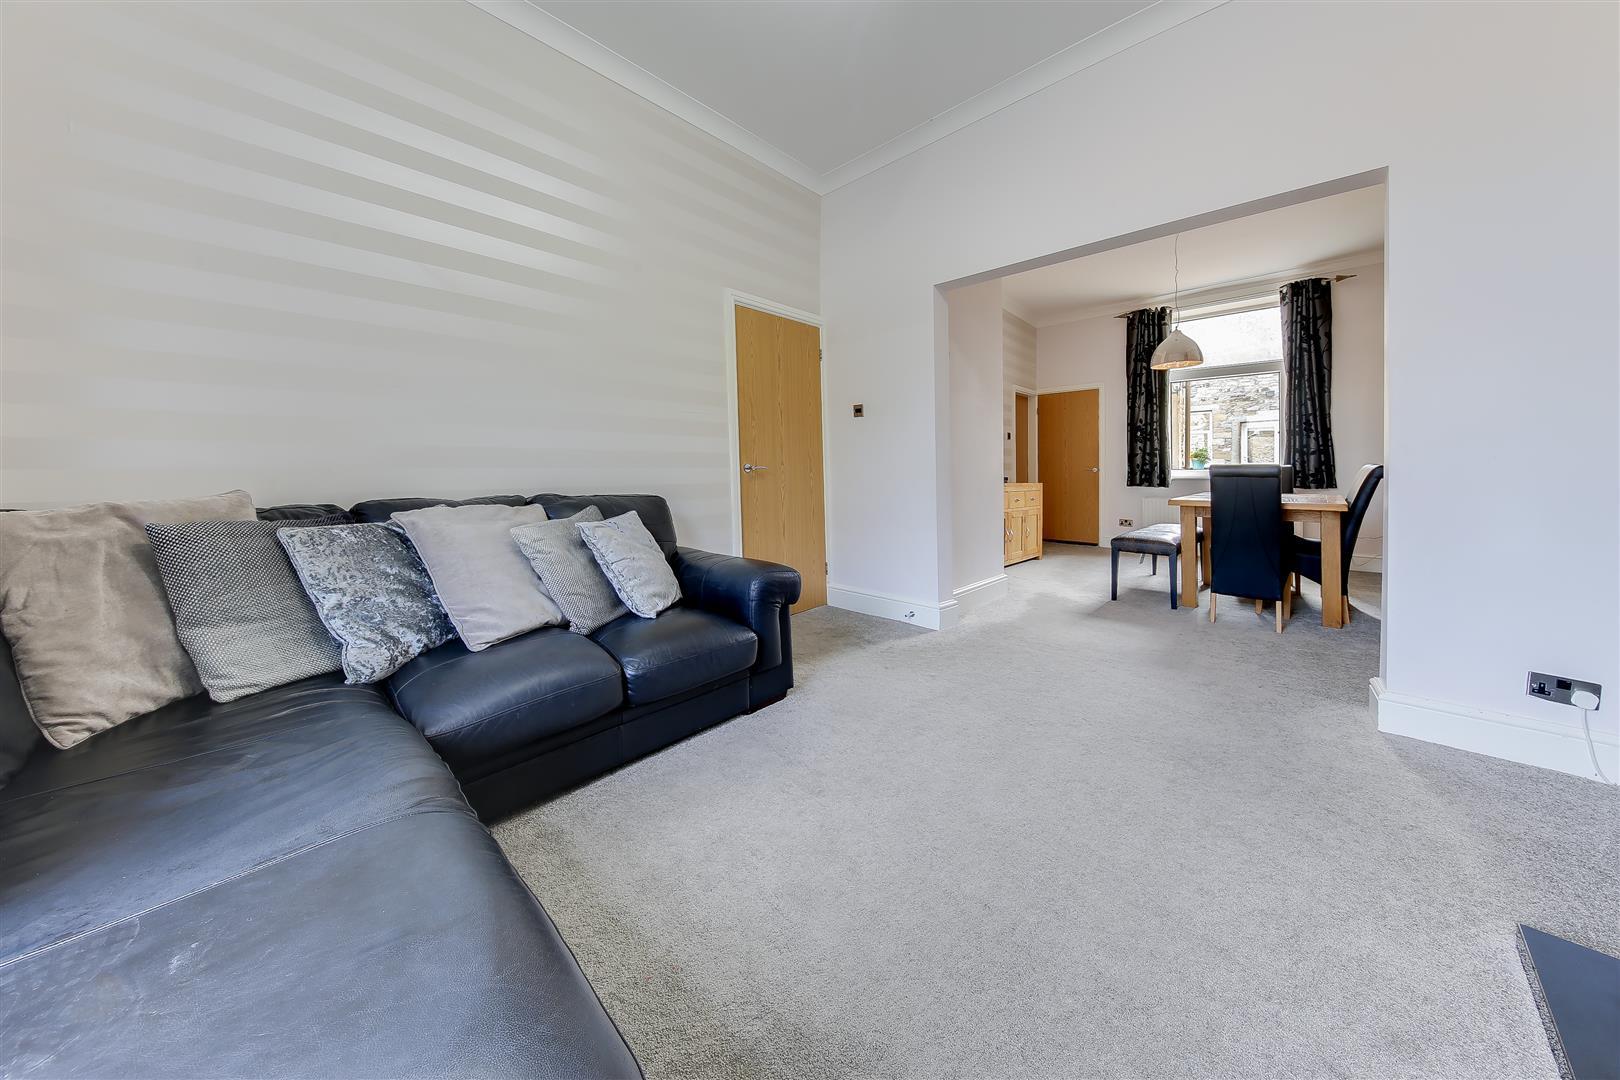 3 bedroom house for sale ashworth road rossendale lancashire bb4